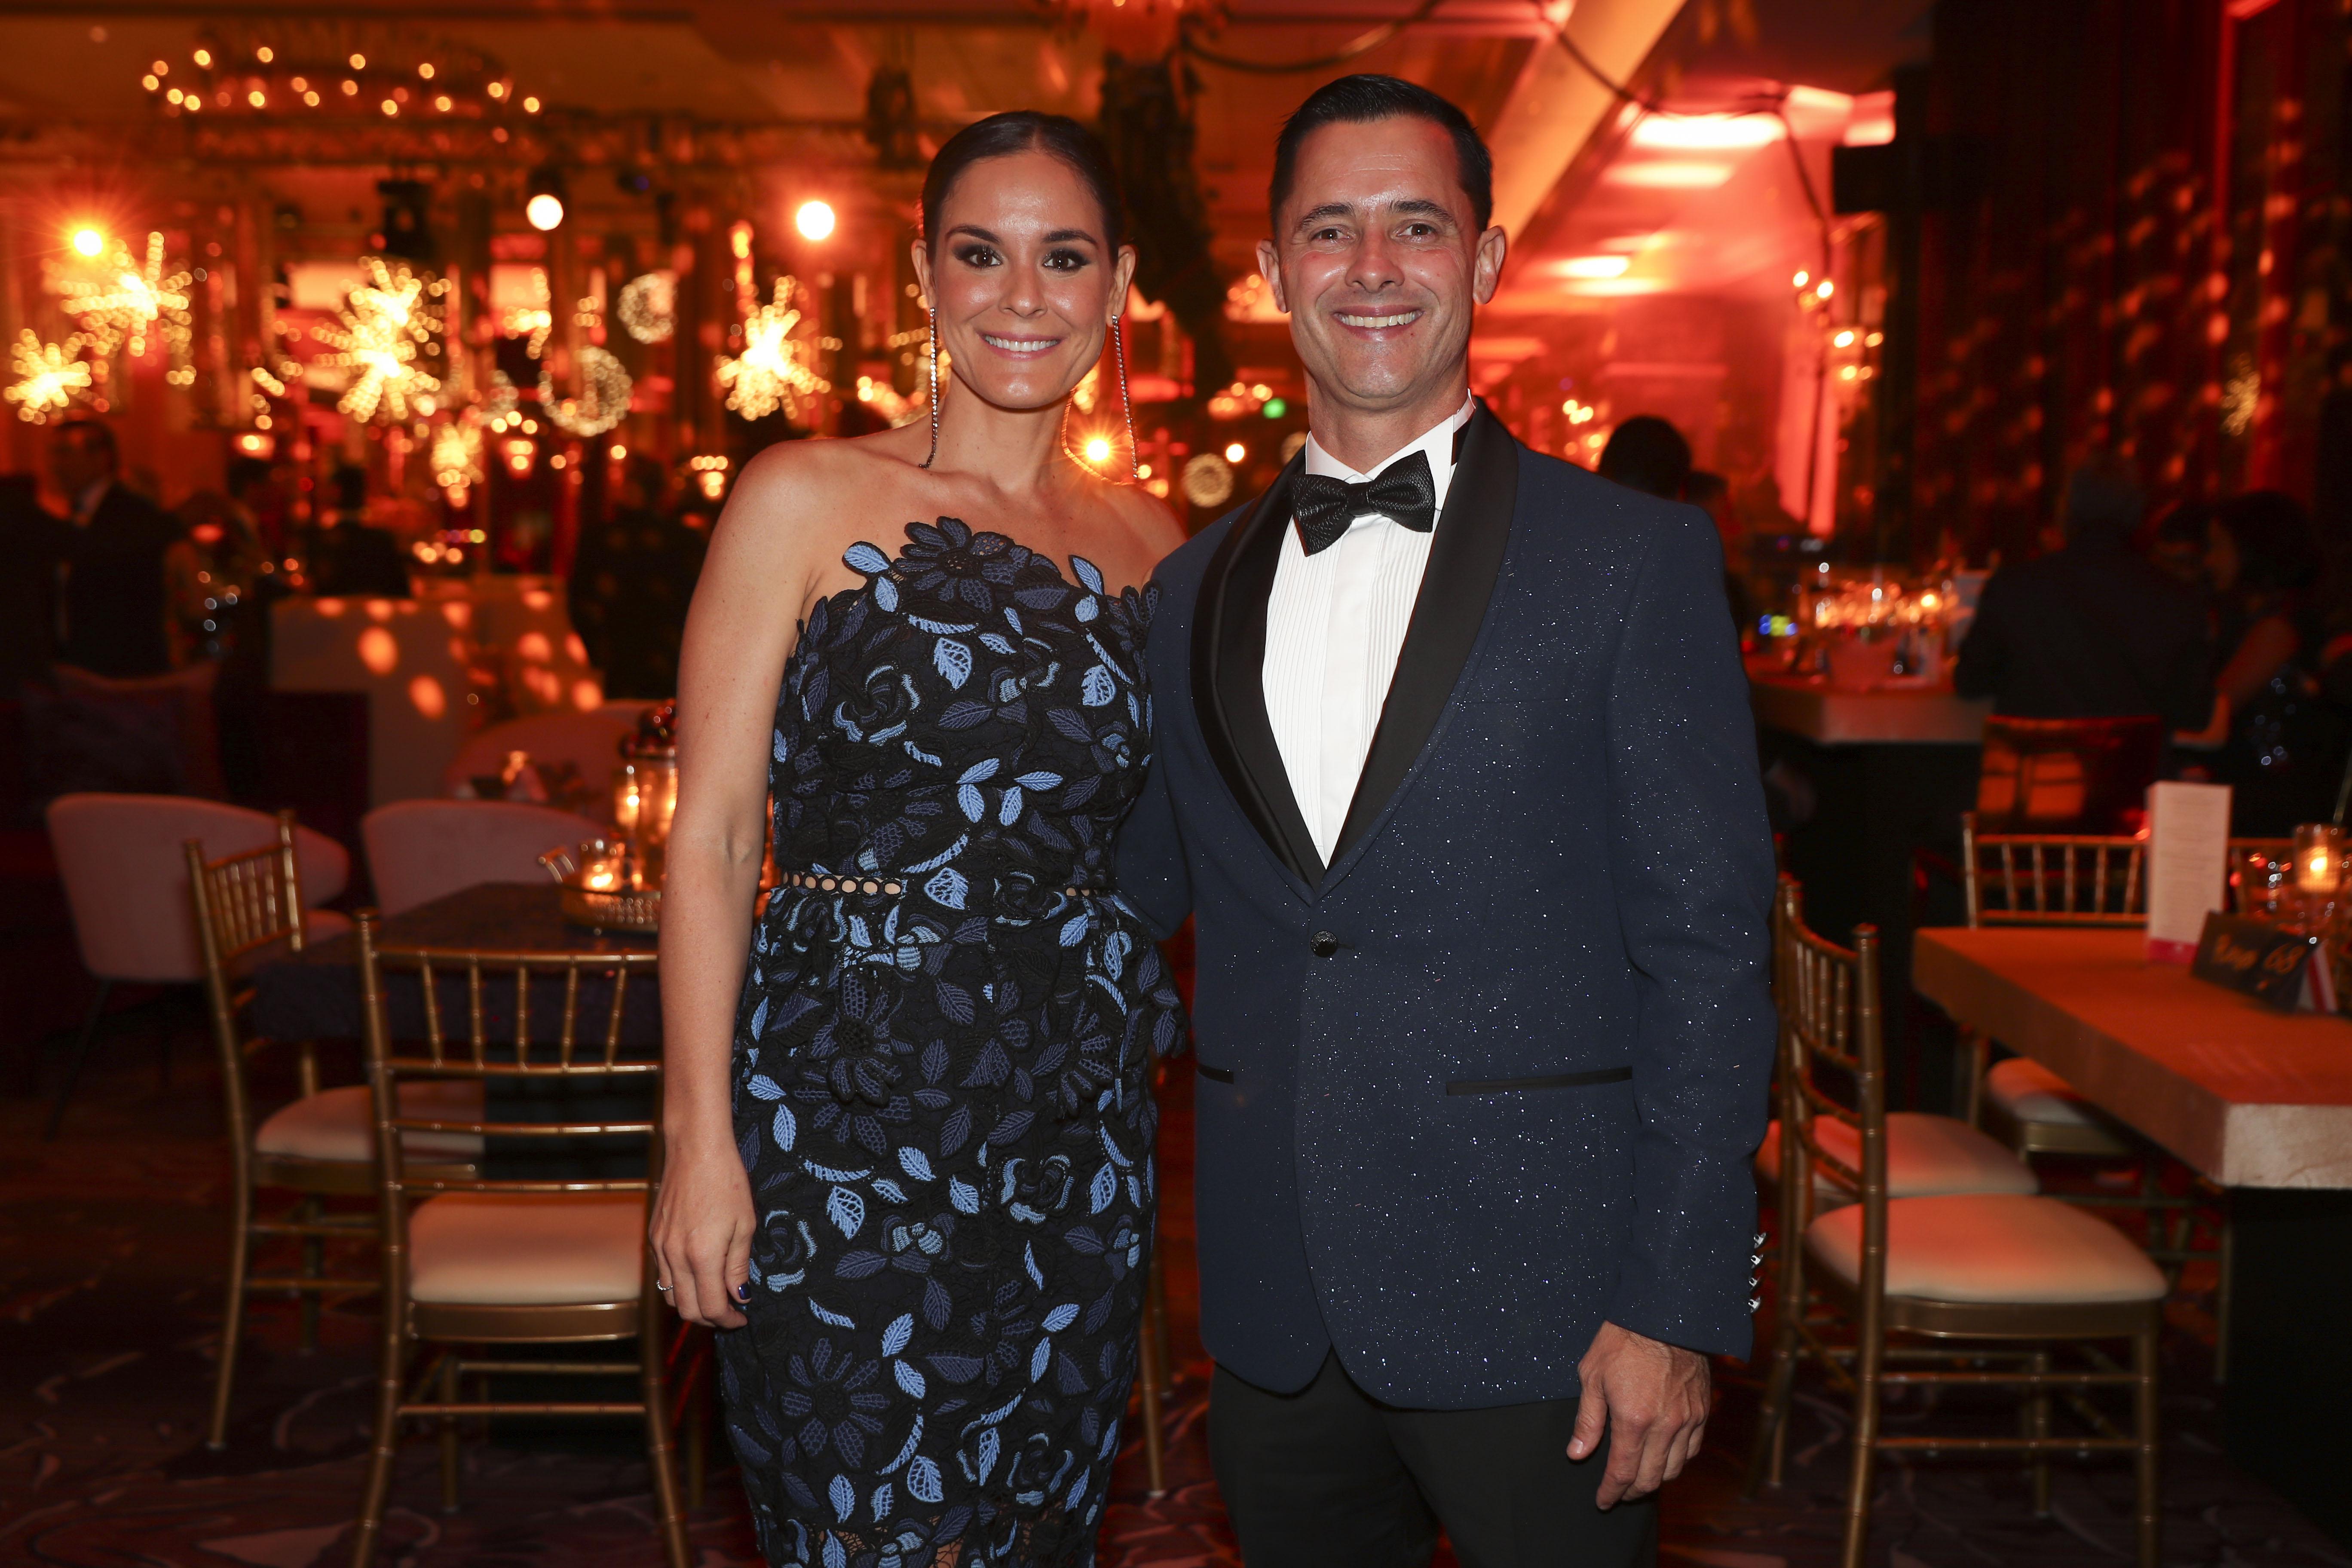 Jeannette Lugo y Nelson Ramírez. (Suministrada)